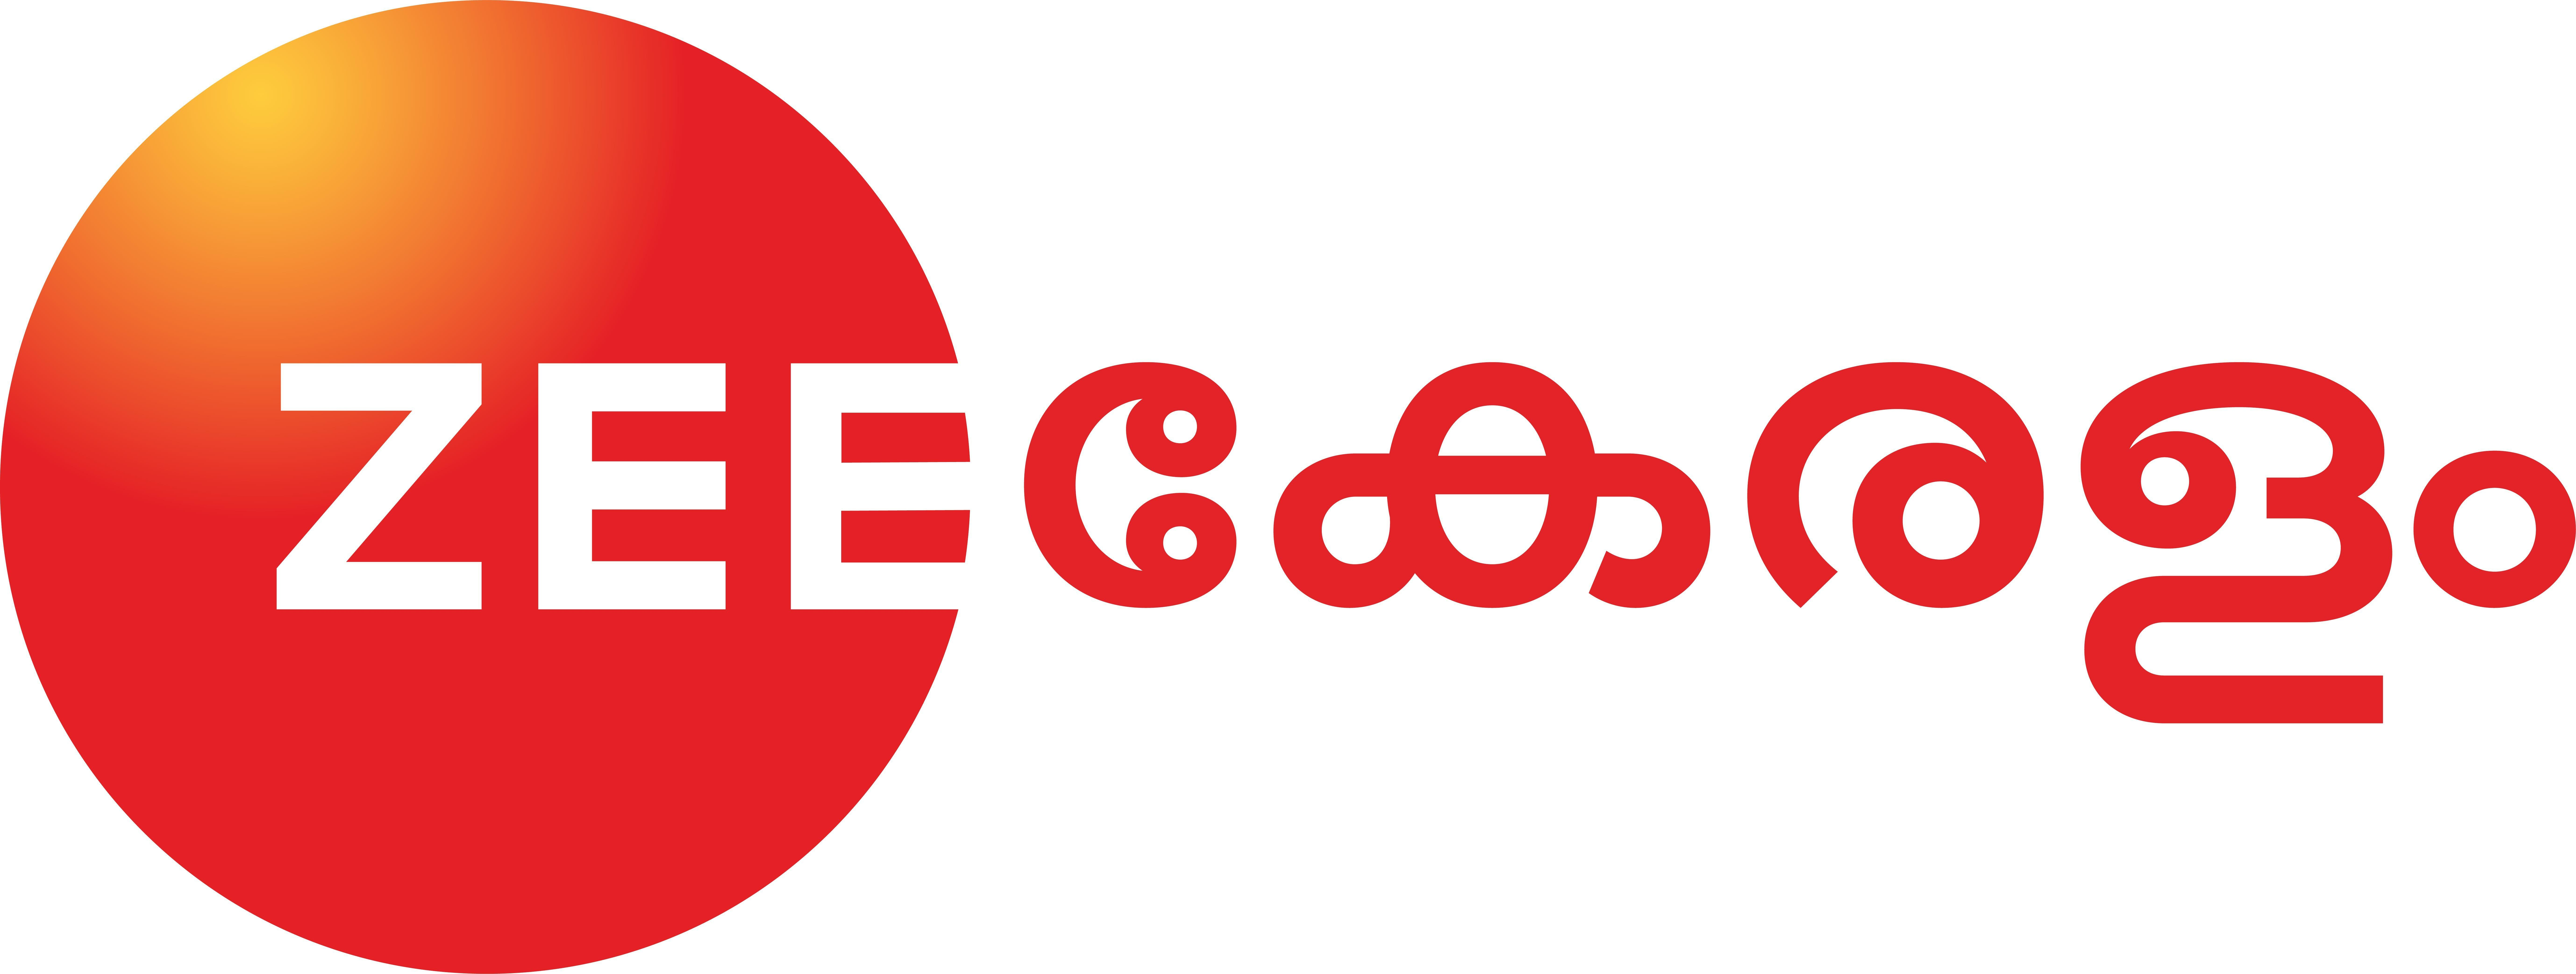 DEN Digital Malayalam Channels List - Amrita TV Moved To 606